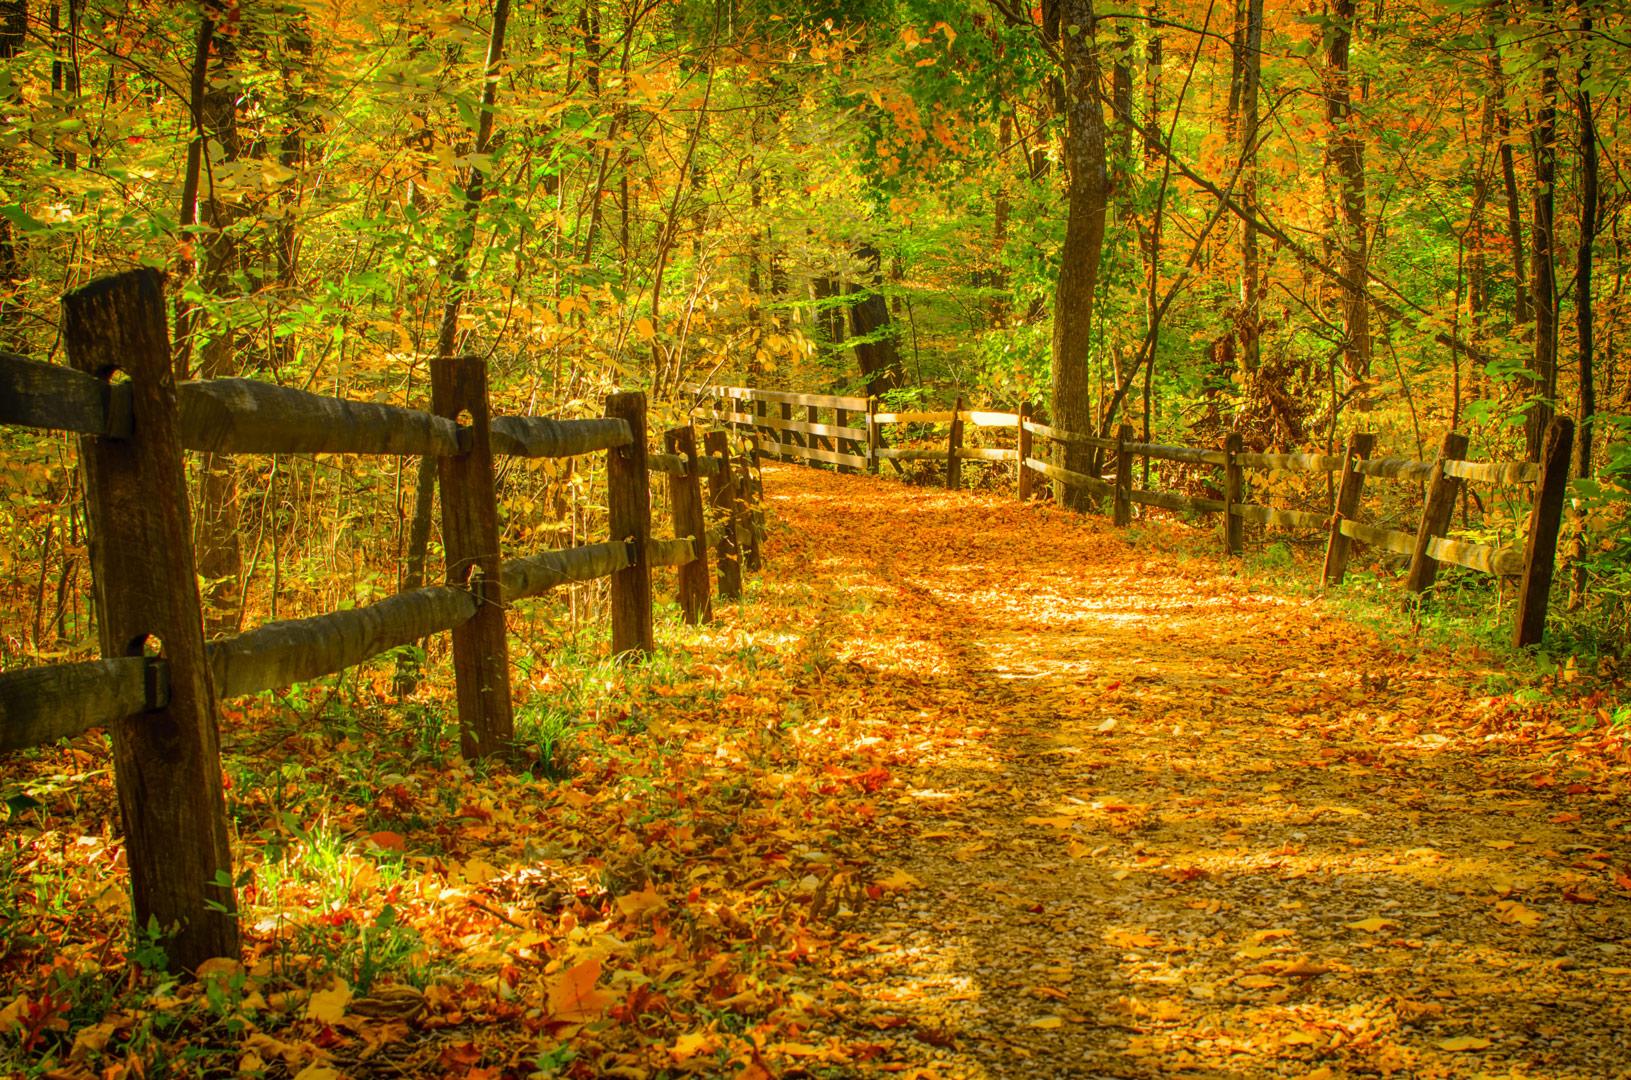 Blendon Woods - Metro Parks - Central Ohio Park System